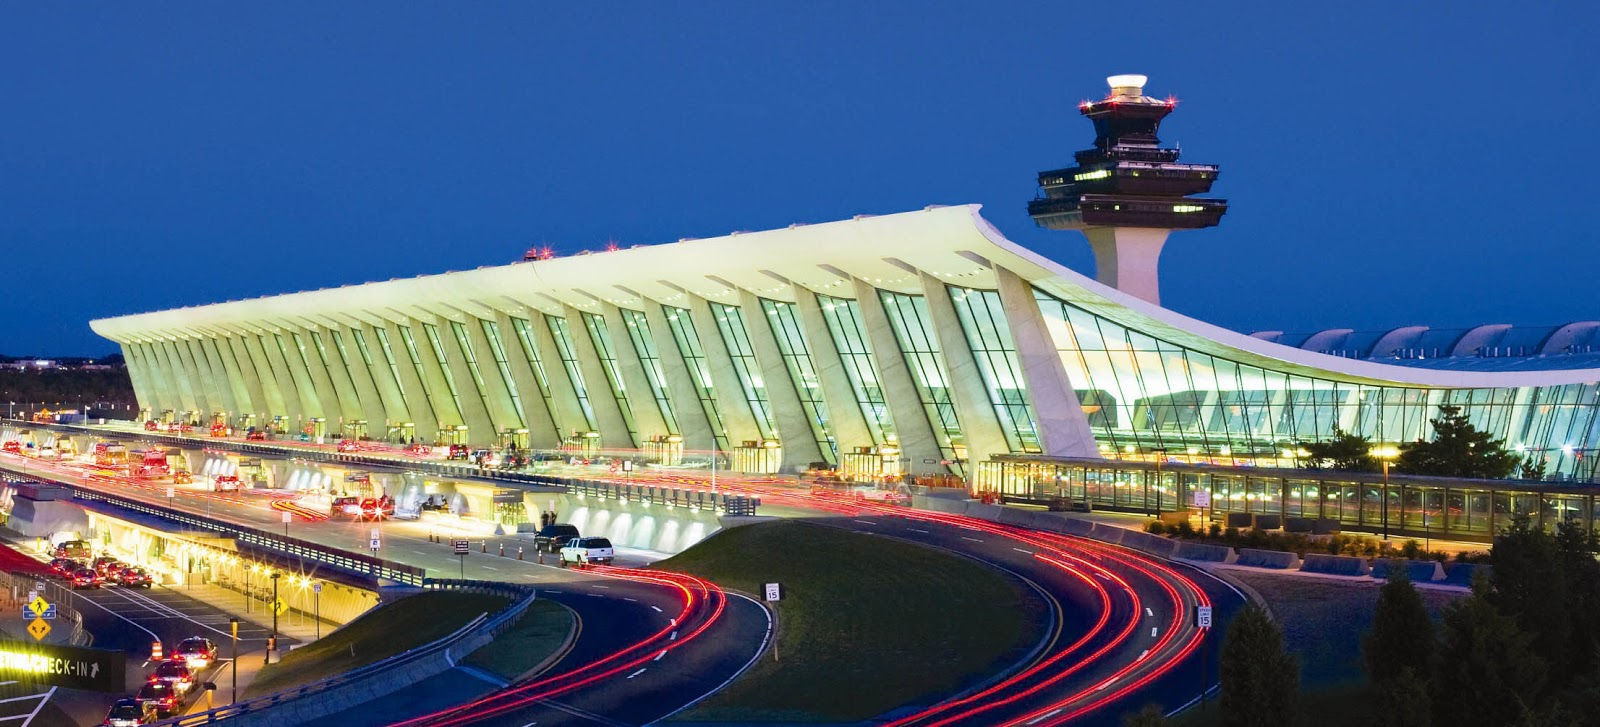 Aeroporto York : Aluguel de carro no aeroporto de washington dicas de nova york